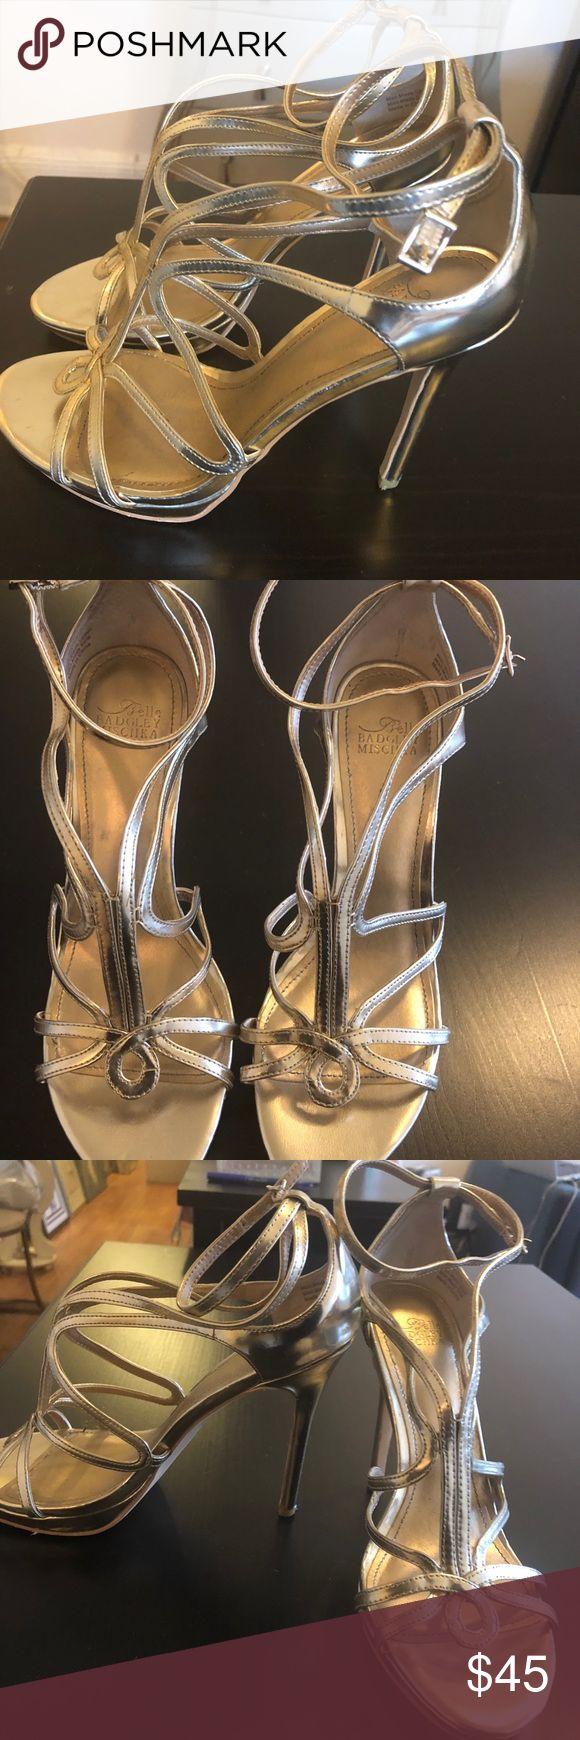 badgley mischka Gold strappy sandals! 7.5 Perfect badgley mischka gold sandals! Perfect for wedding, party or more Badgley Mischka Shoes Sandals